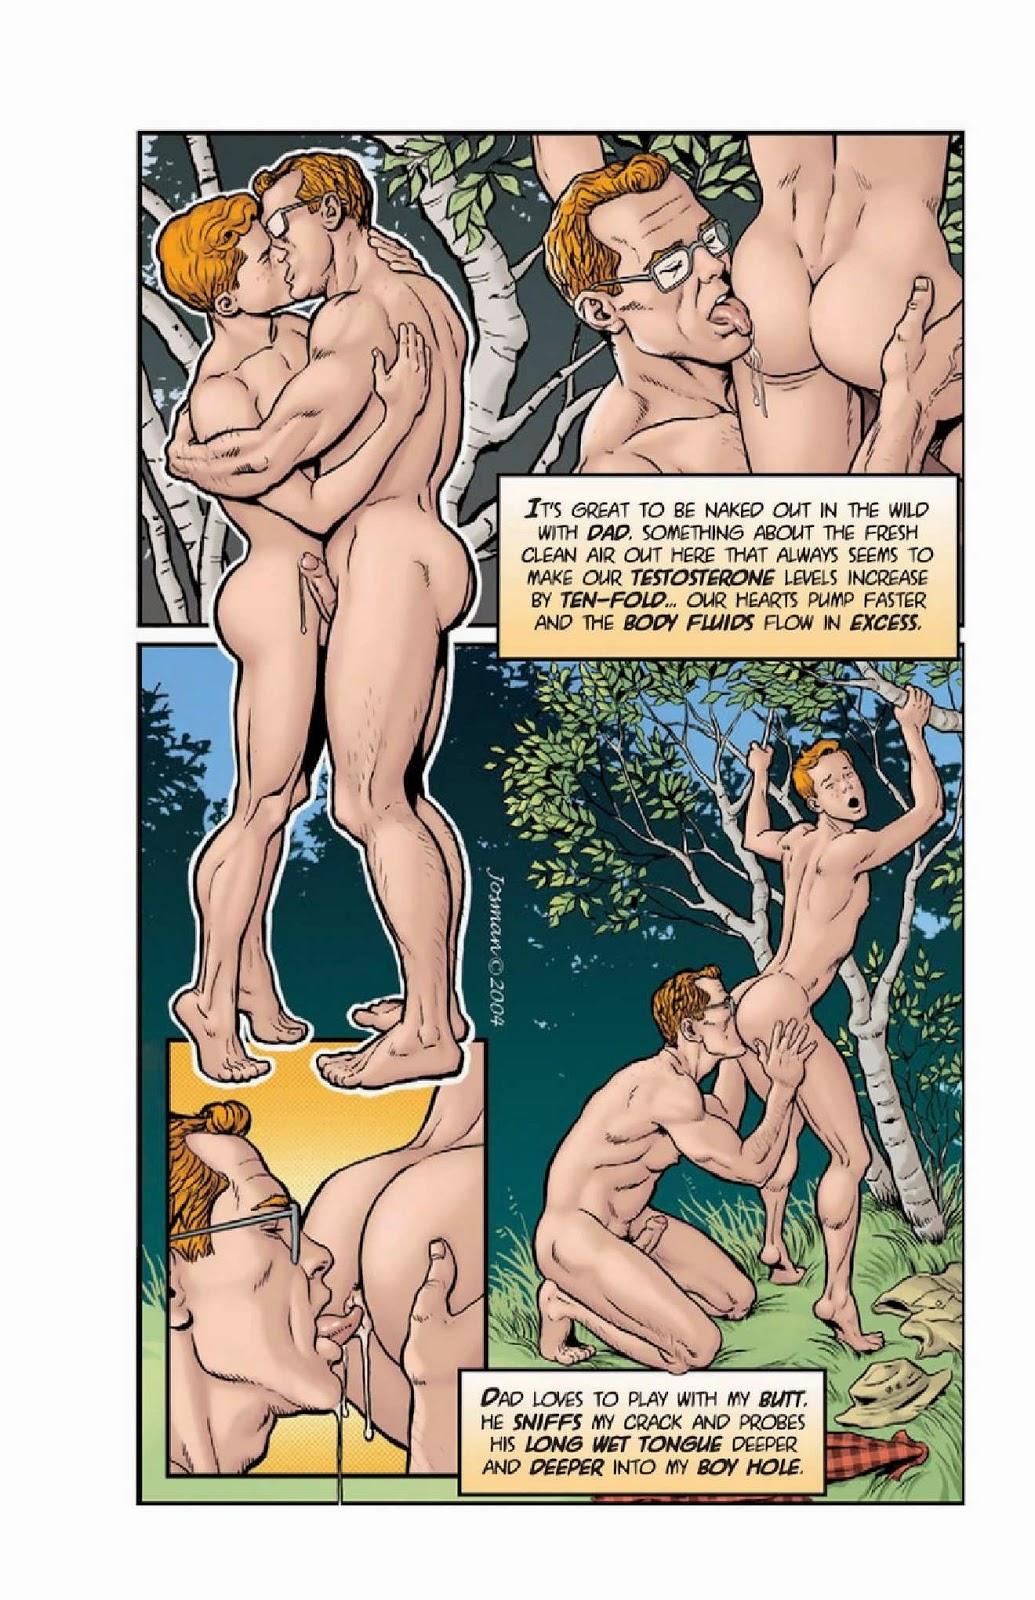 comics porno en español gay bareback videos